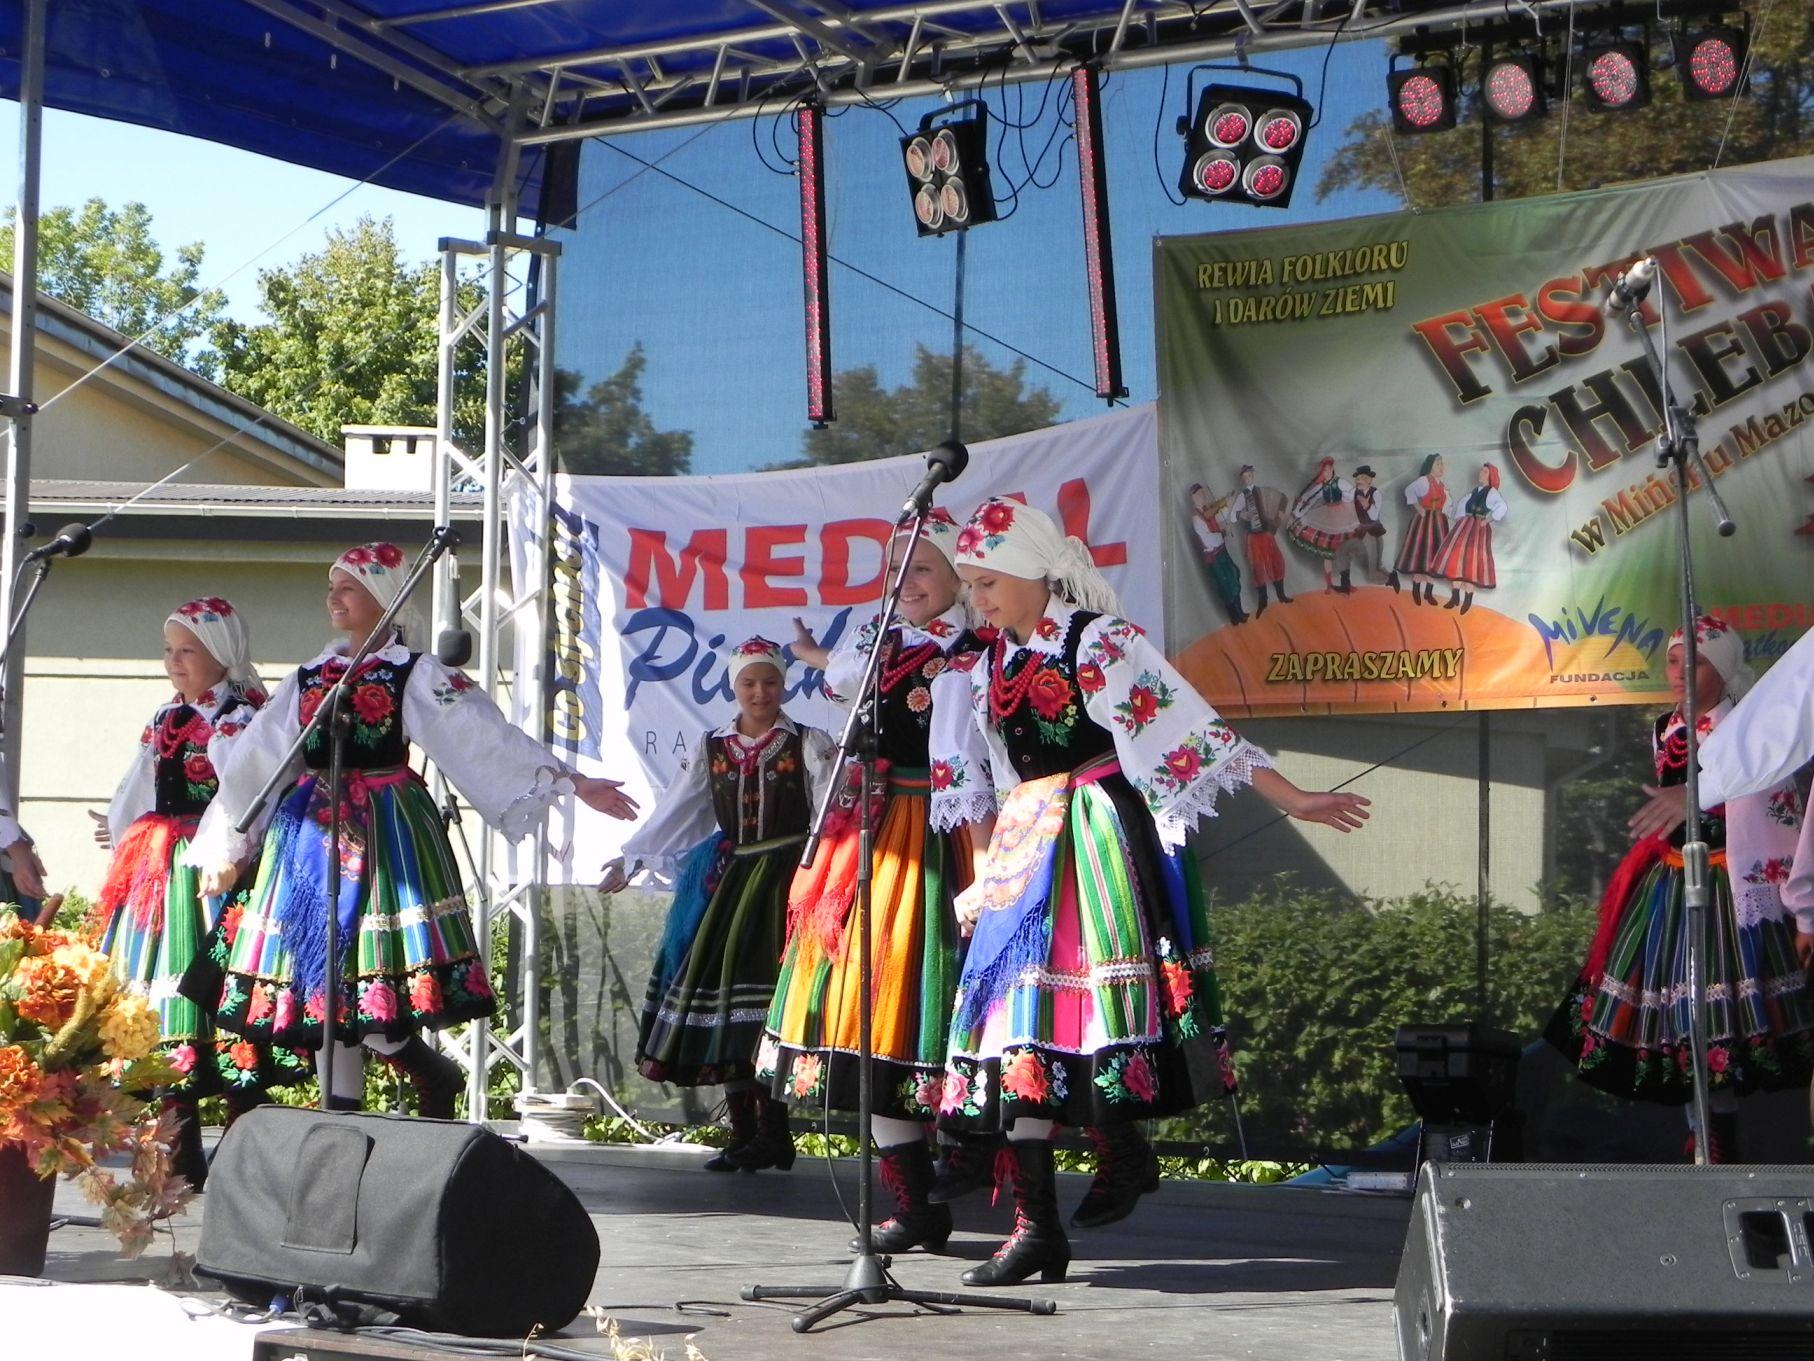 2013-09-10 Festyn - Mińsk Maz (2)